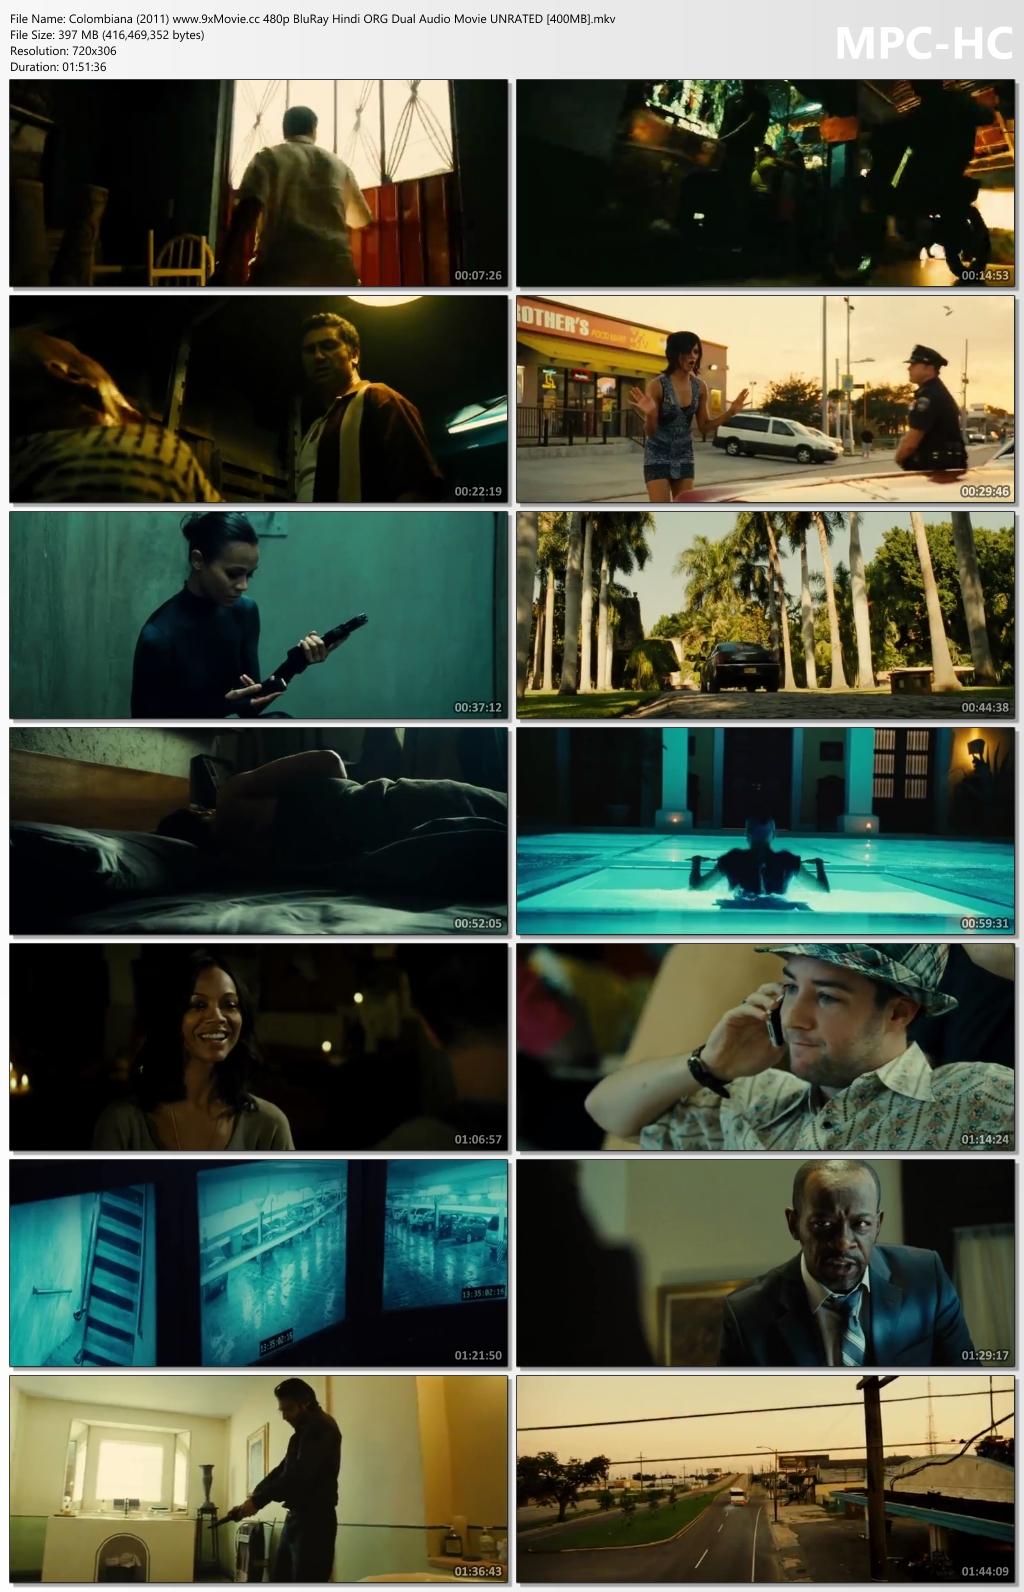 Colombiana-2011-www-9x-Movie-cc-480p-Blu-Ray-Hindi-ORG-Dual-Audio-Movie-UNRATED-400-MB-mkv